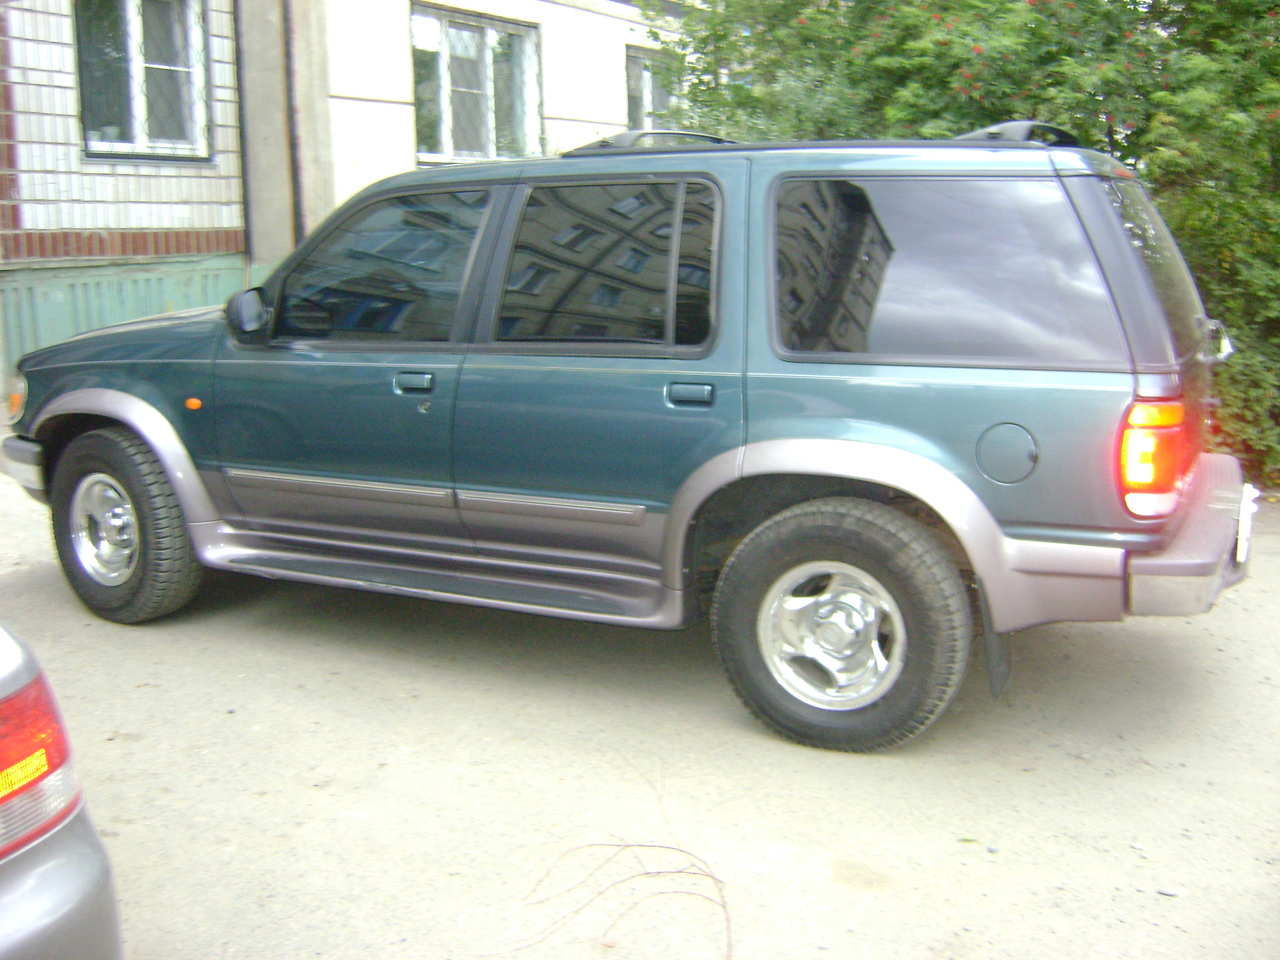 1997 ford explorer photos 4 0 gasoline manual for sale